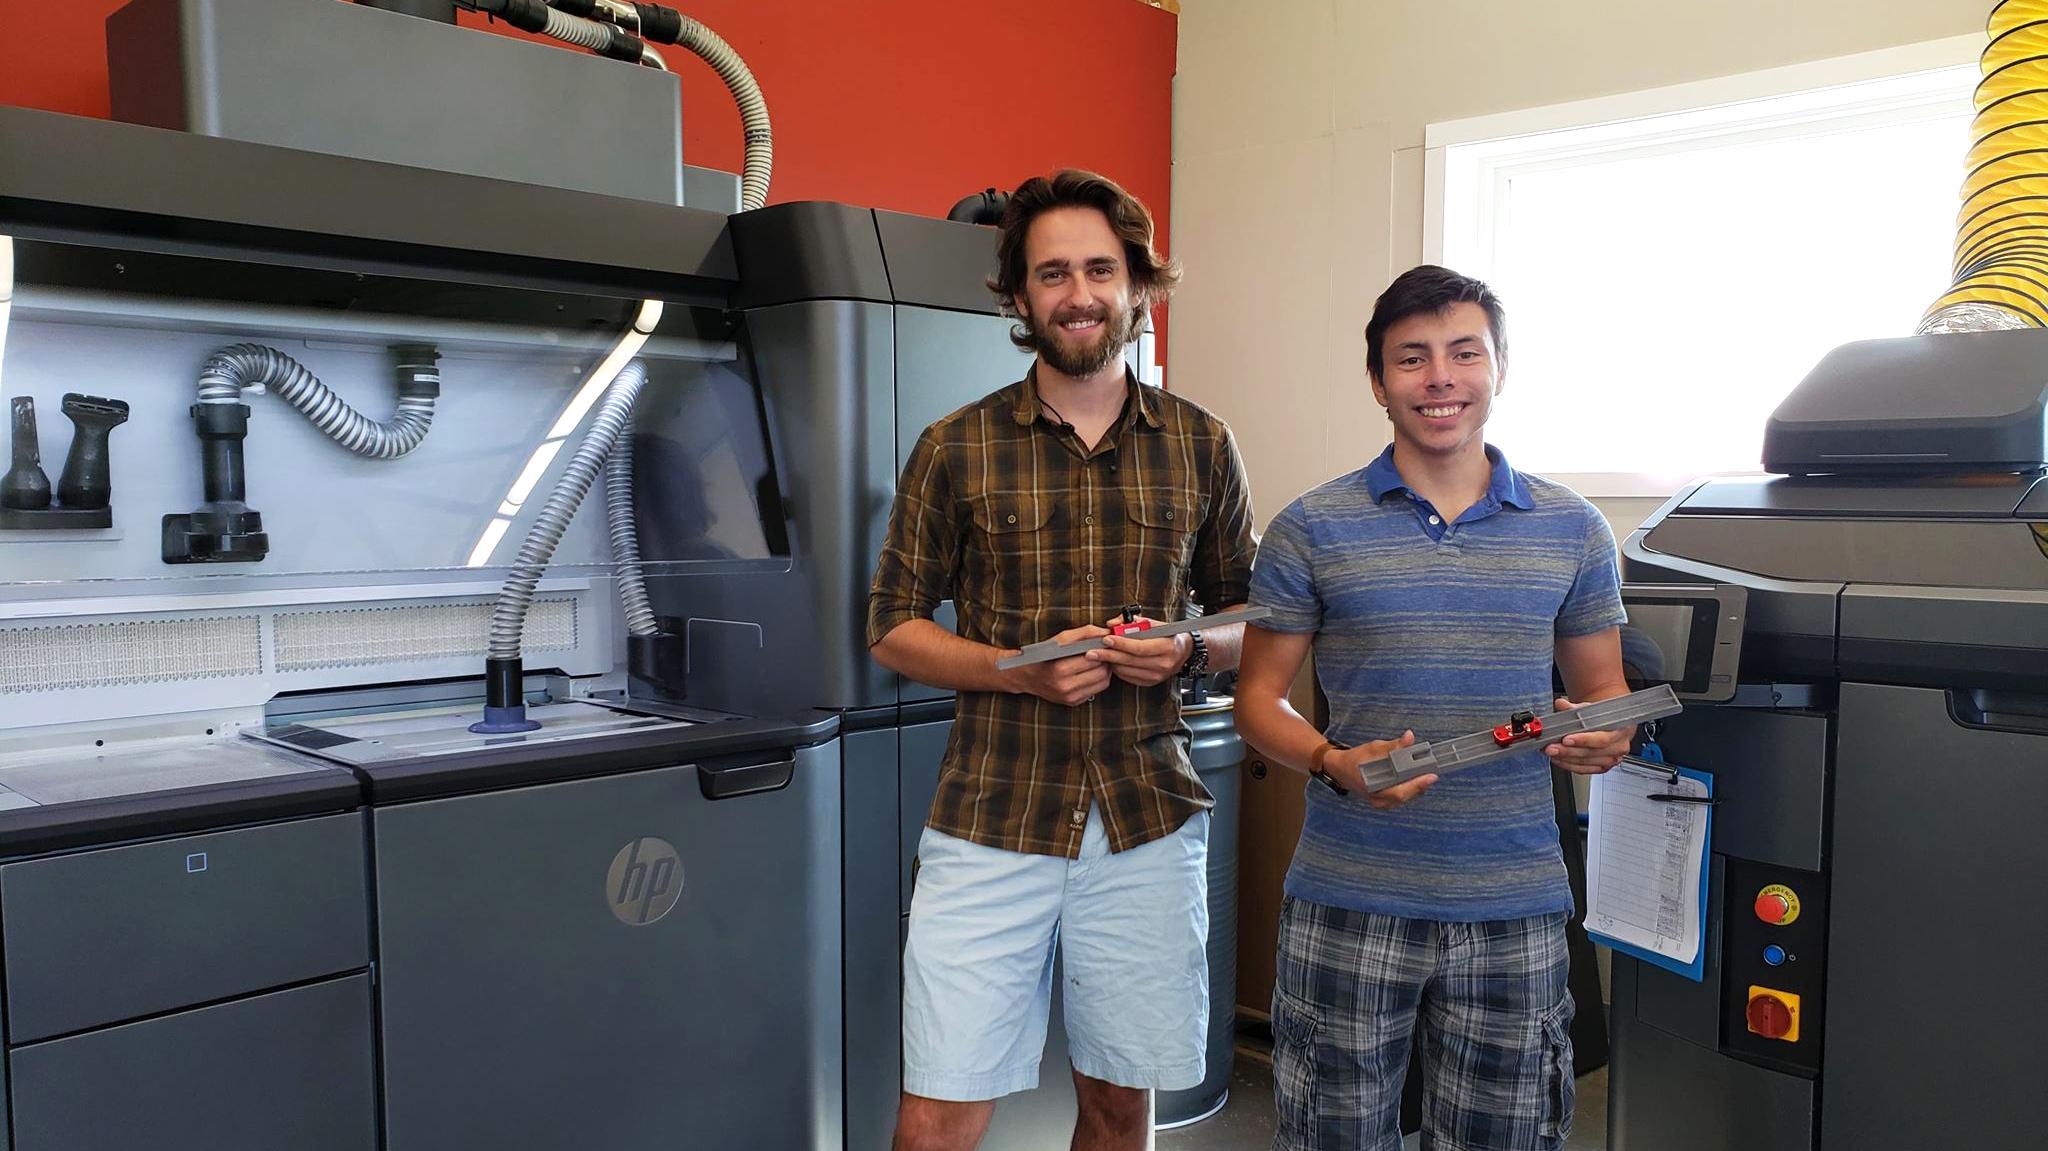 SciTechsperience, SciTech, STEM, STEM internships, paid internship, Minnesota, DI Labs, 3D Printing